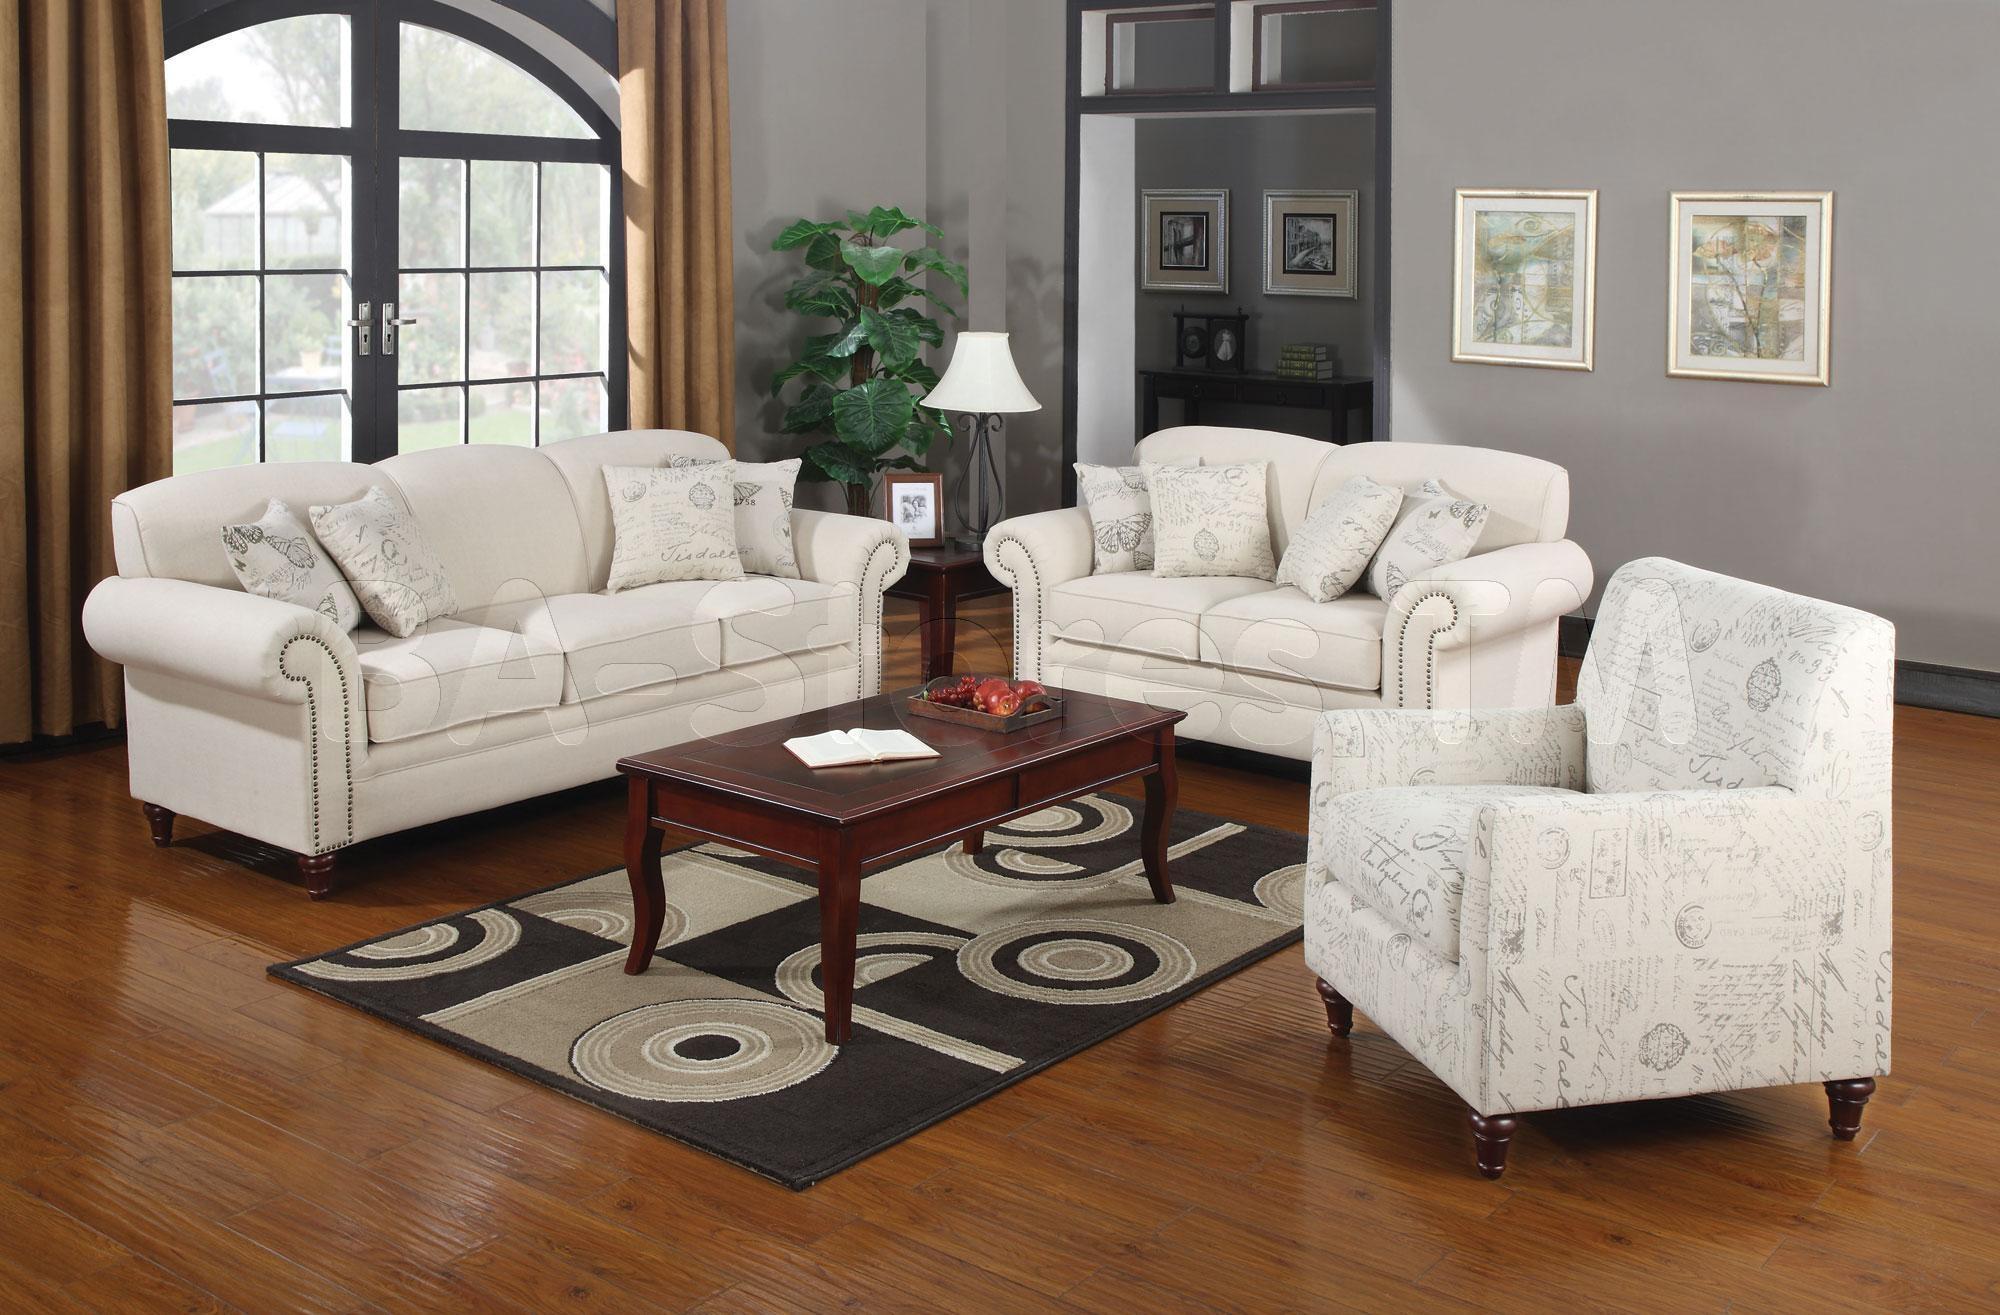 Modern Living Room Sofa Sets Inside Living Room Sofa Chairs (Image 12 of 15)